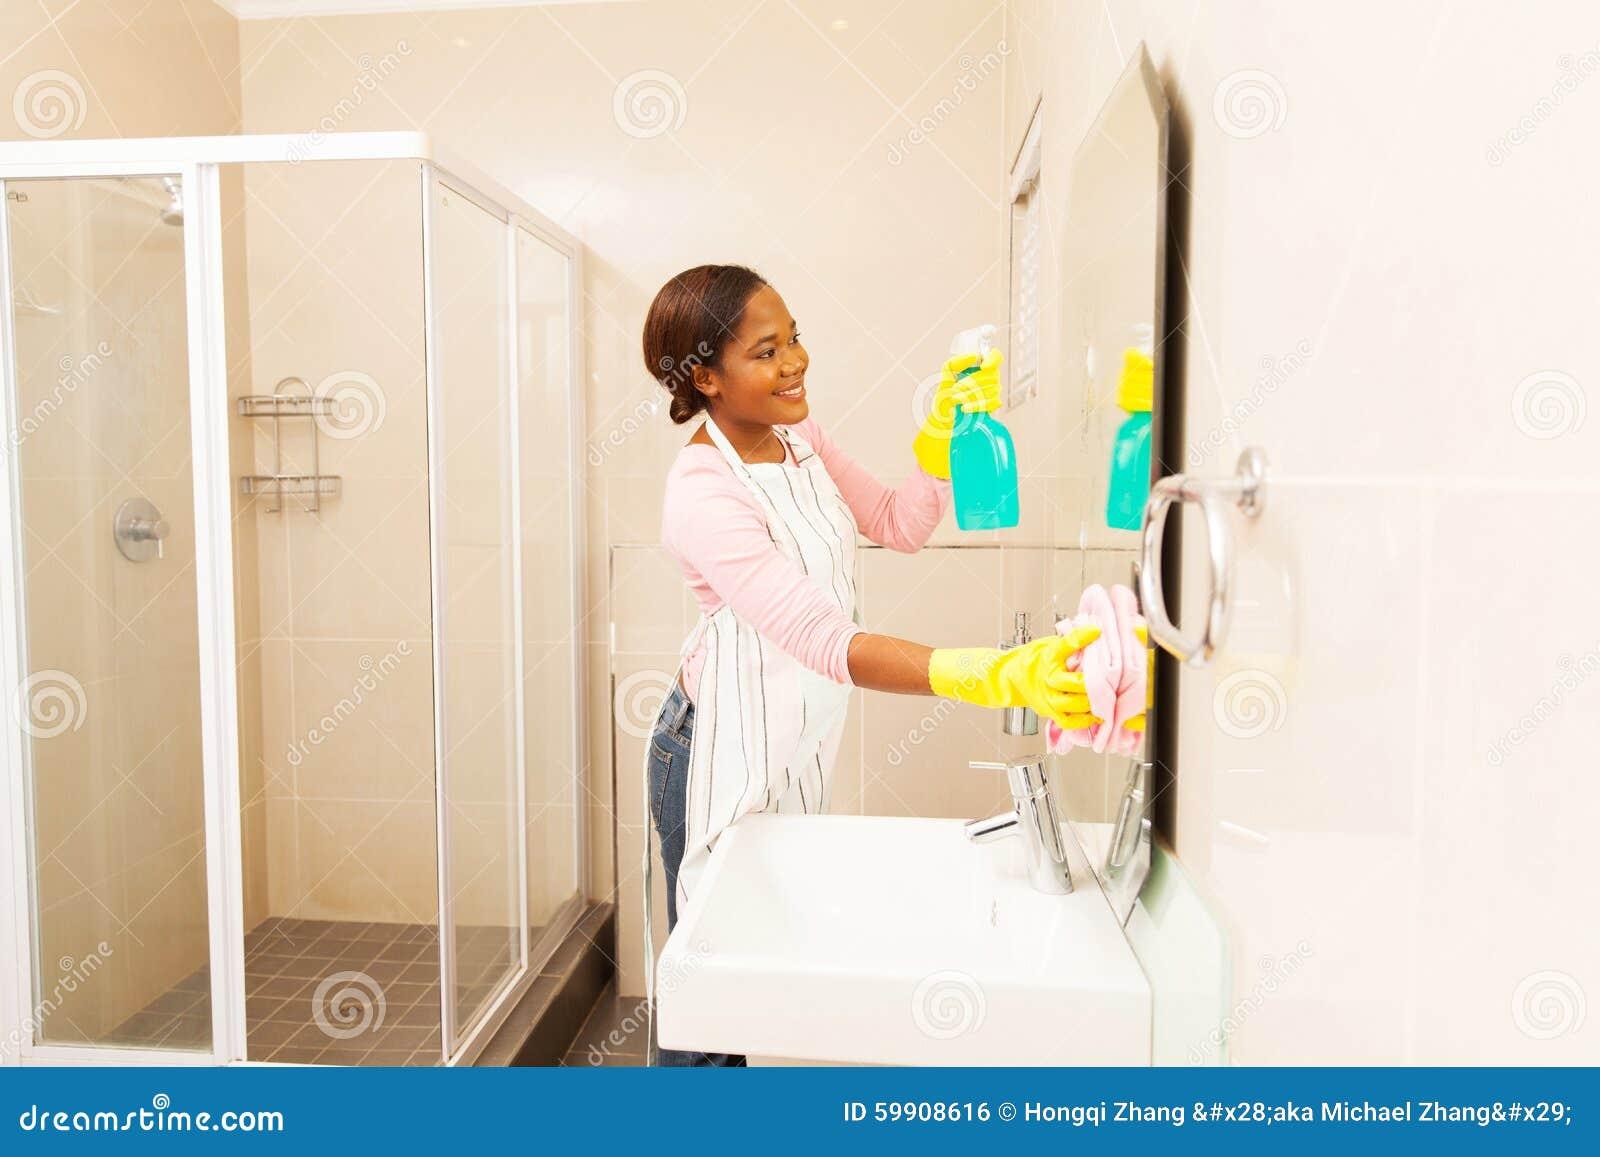 Plante Salle De Bain Lumineuse ~ Salle De Bains Africaine De Nettoyage De Femme Photo Stock Image